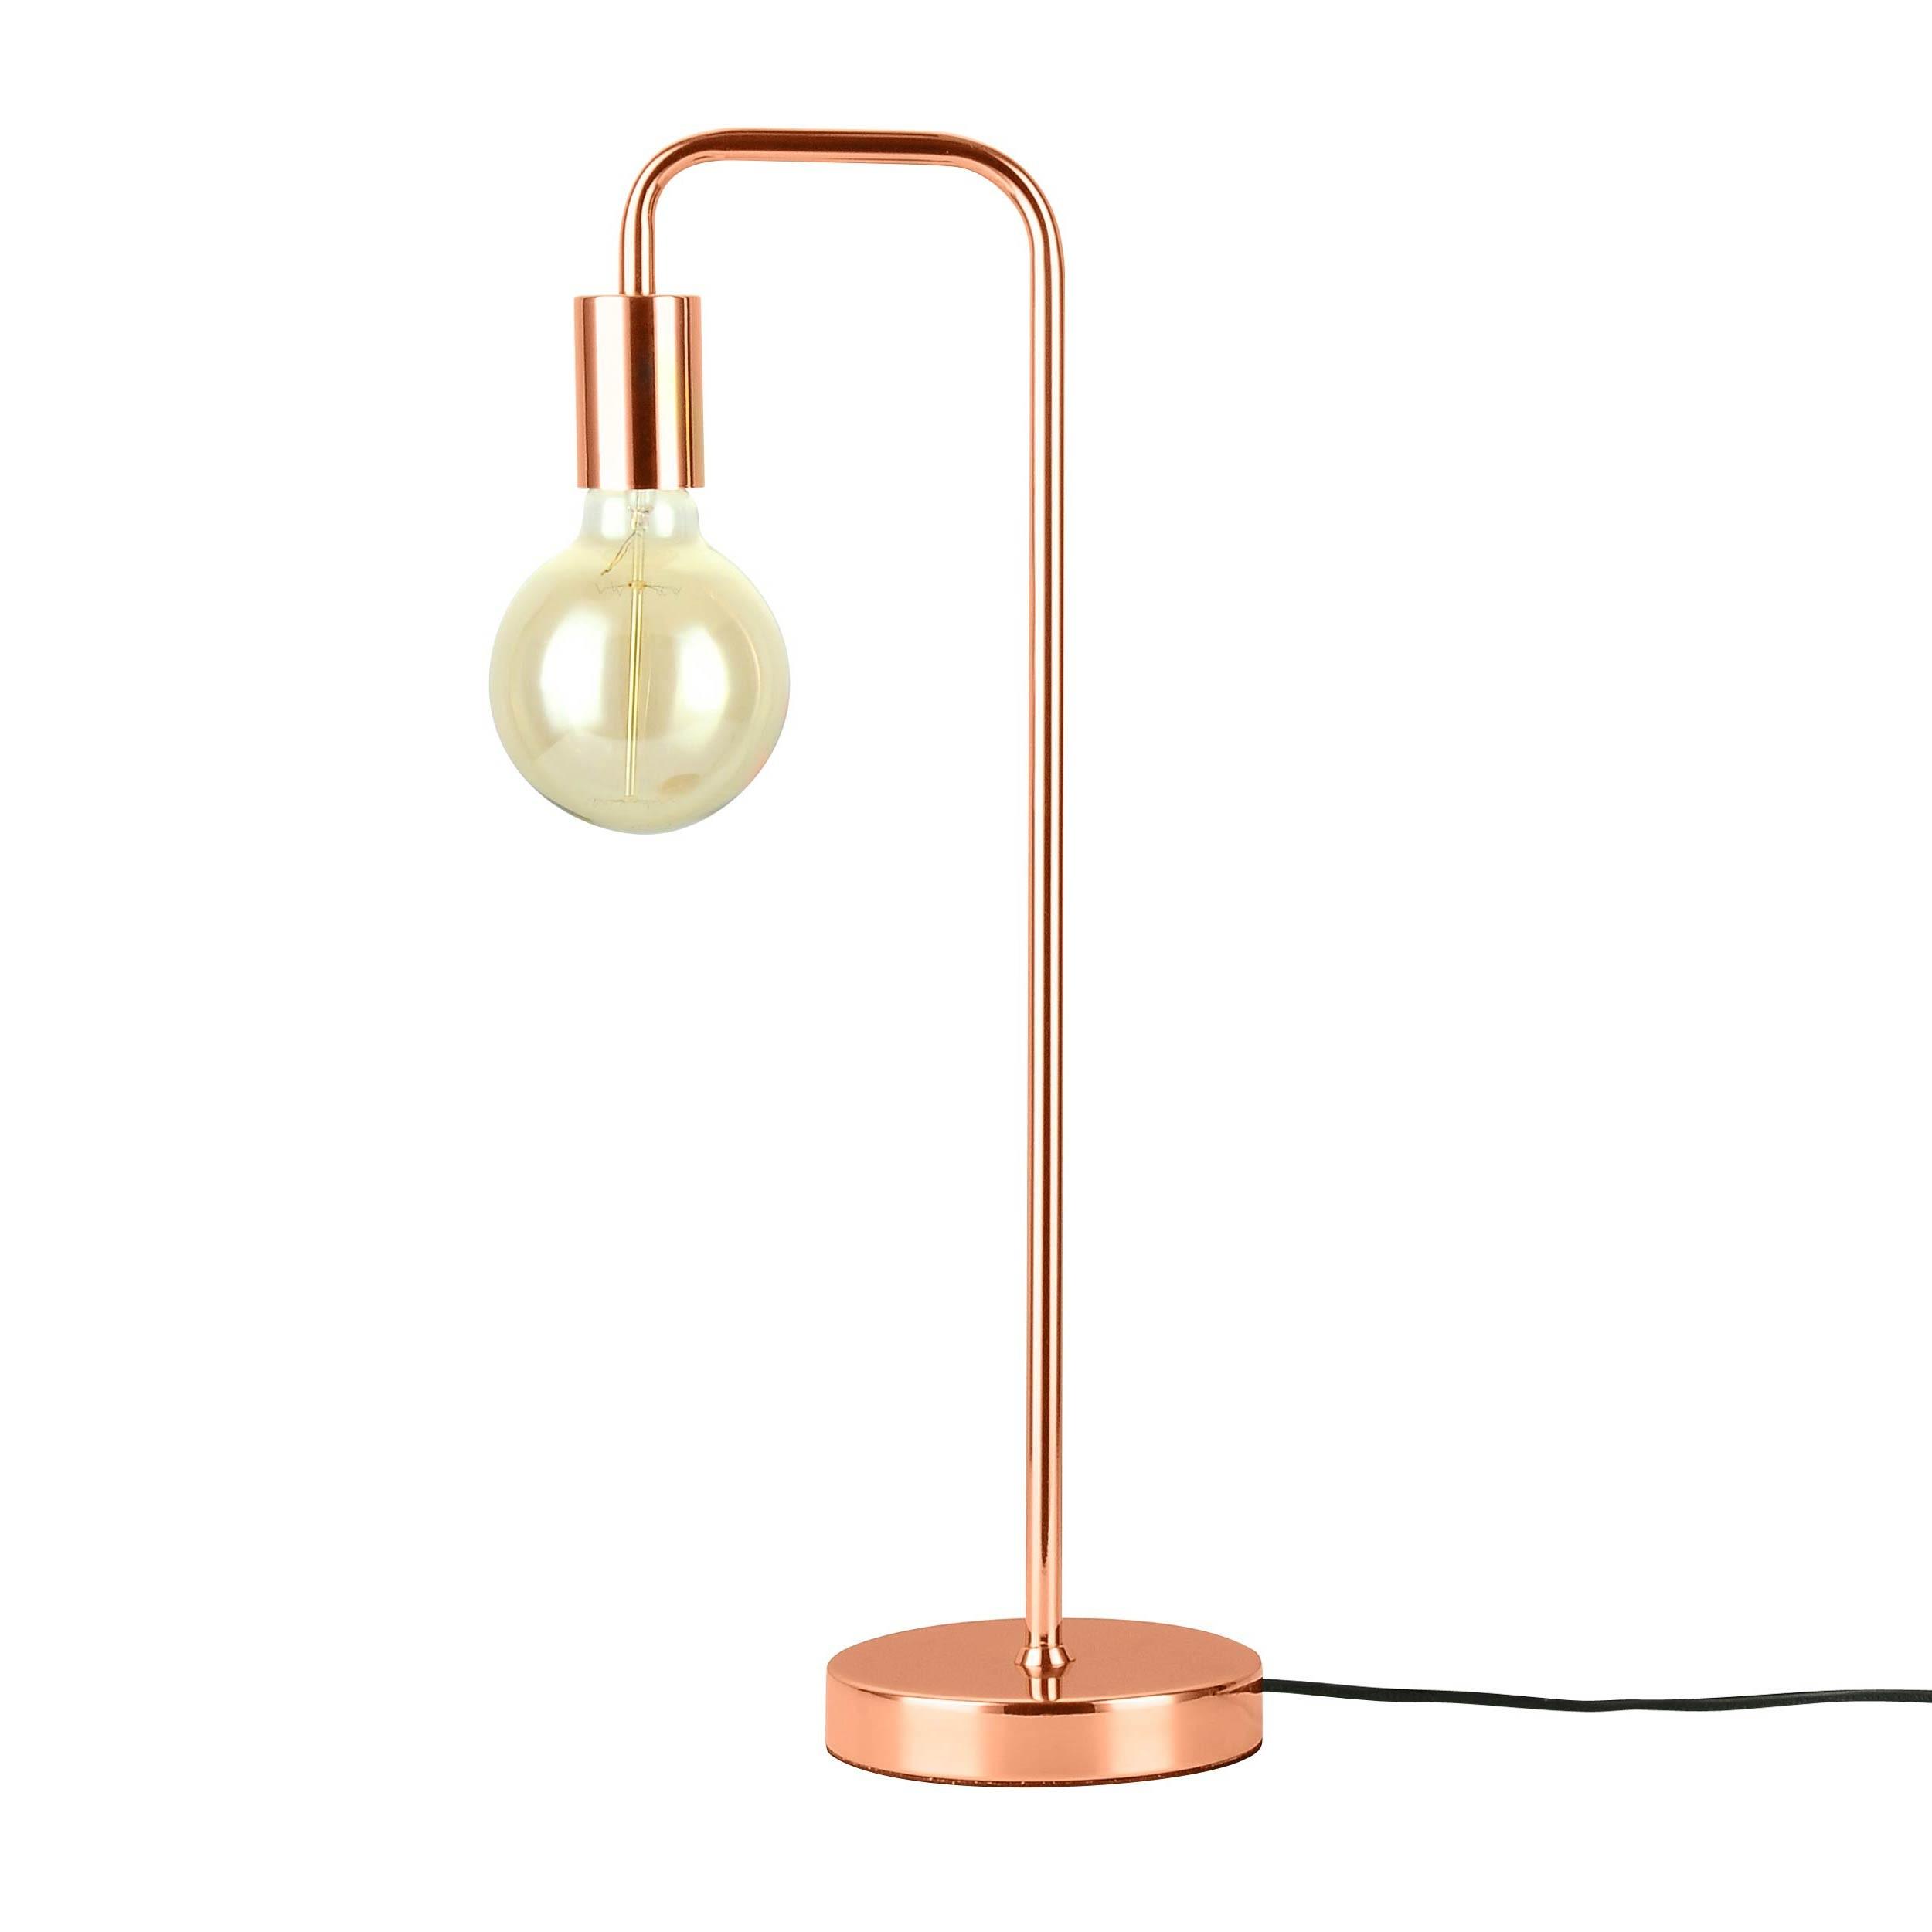 acheter lampe design metal finition cuivre